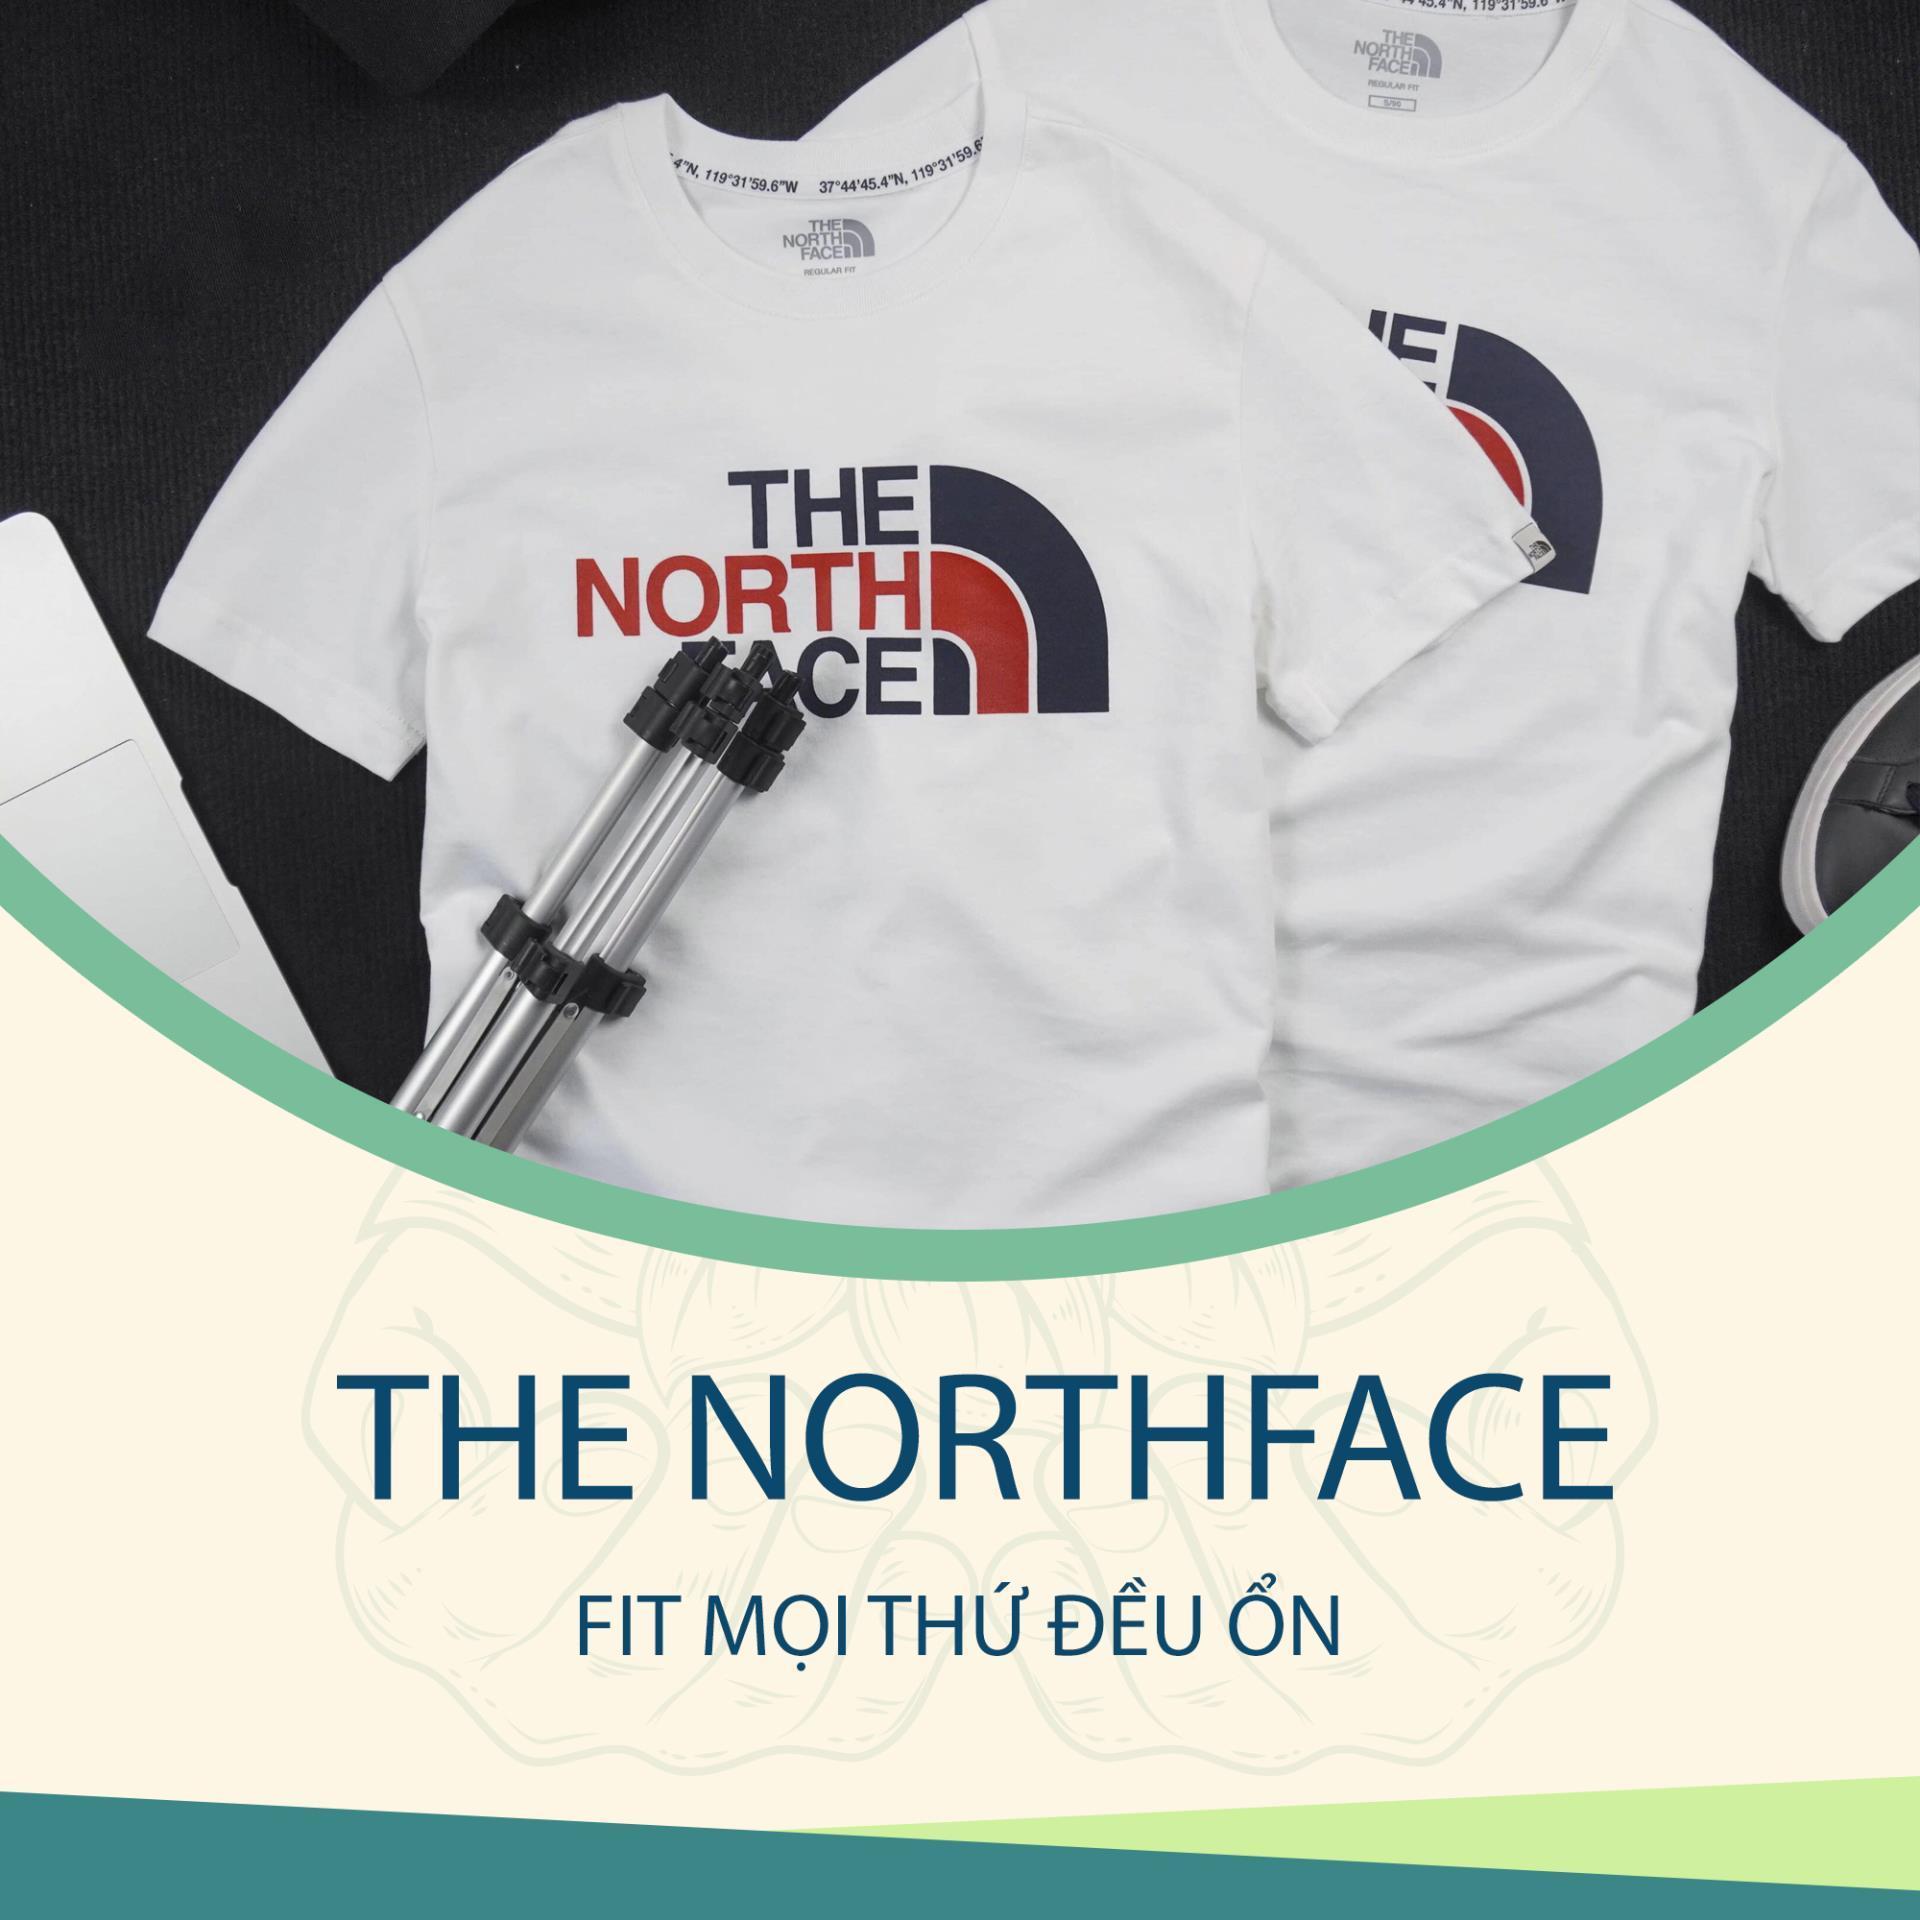 ao-thun-the-northface-fit-moi-thu-deu-on